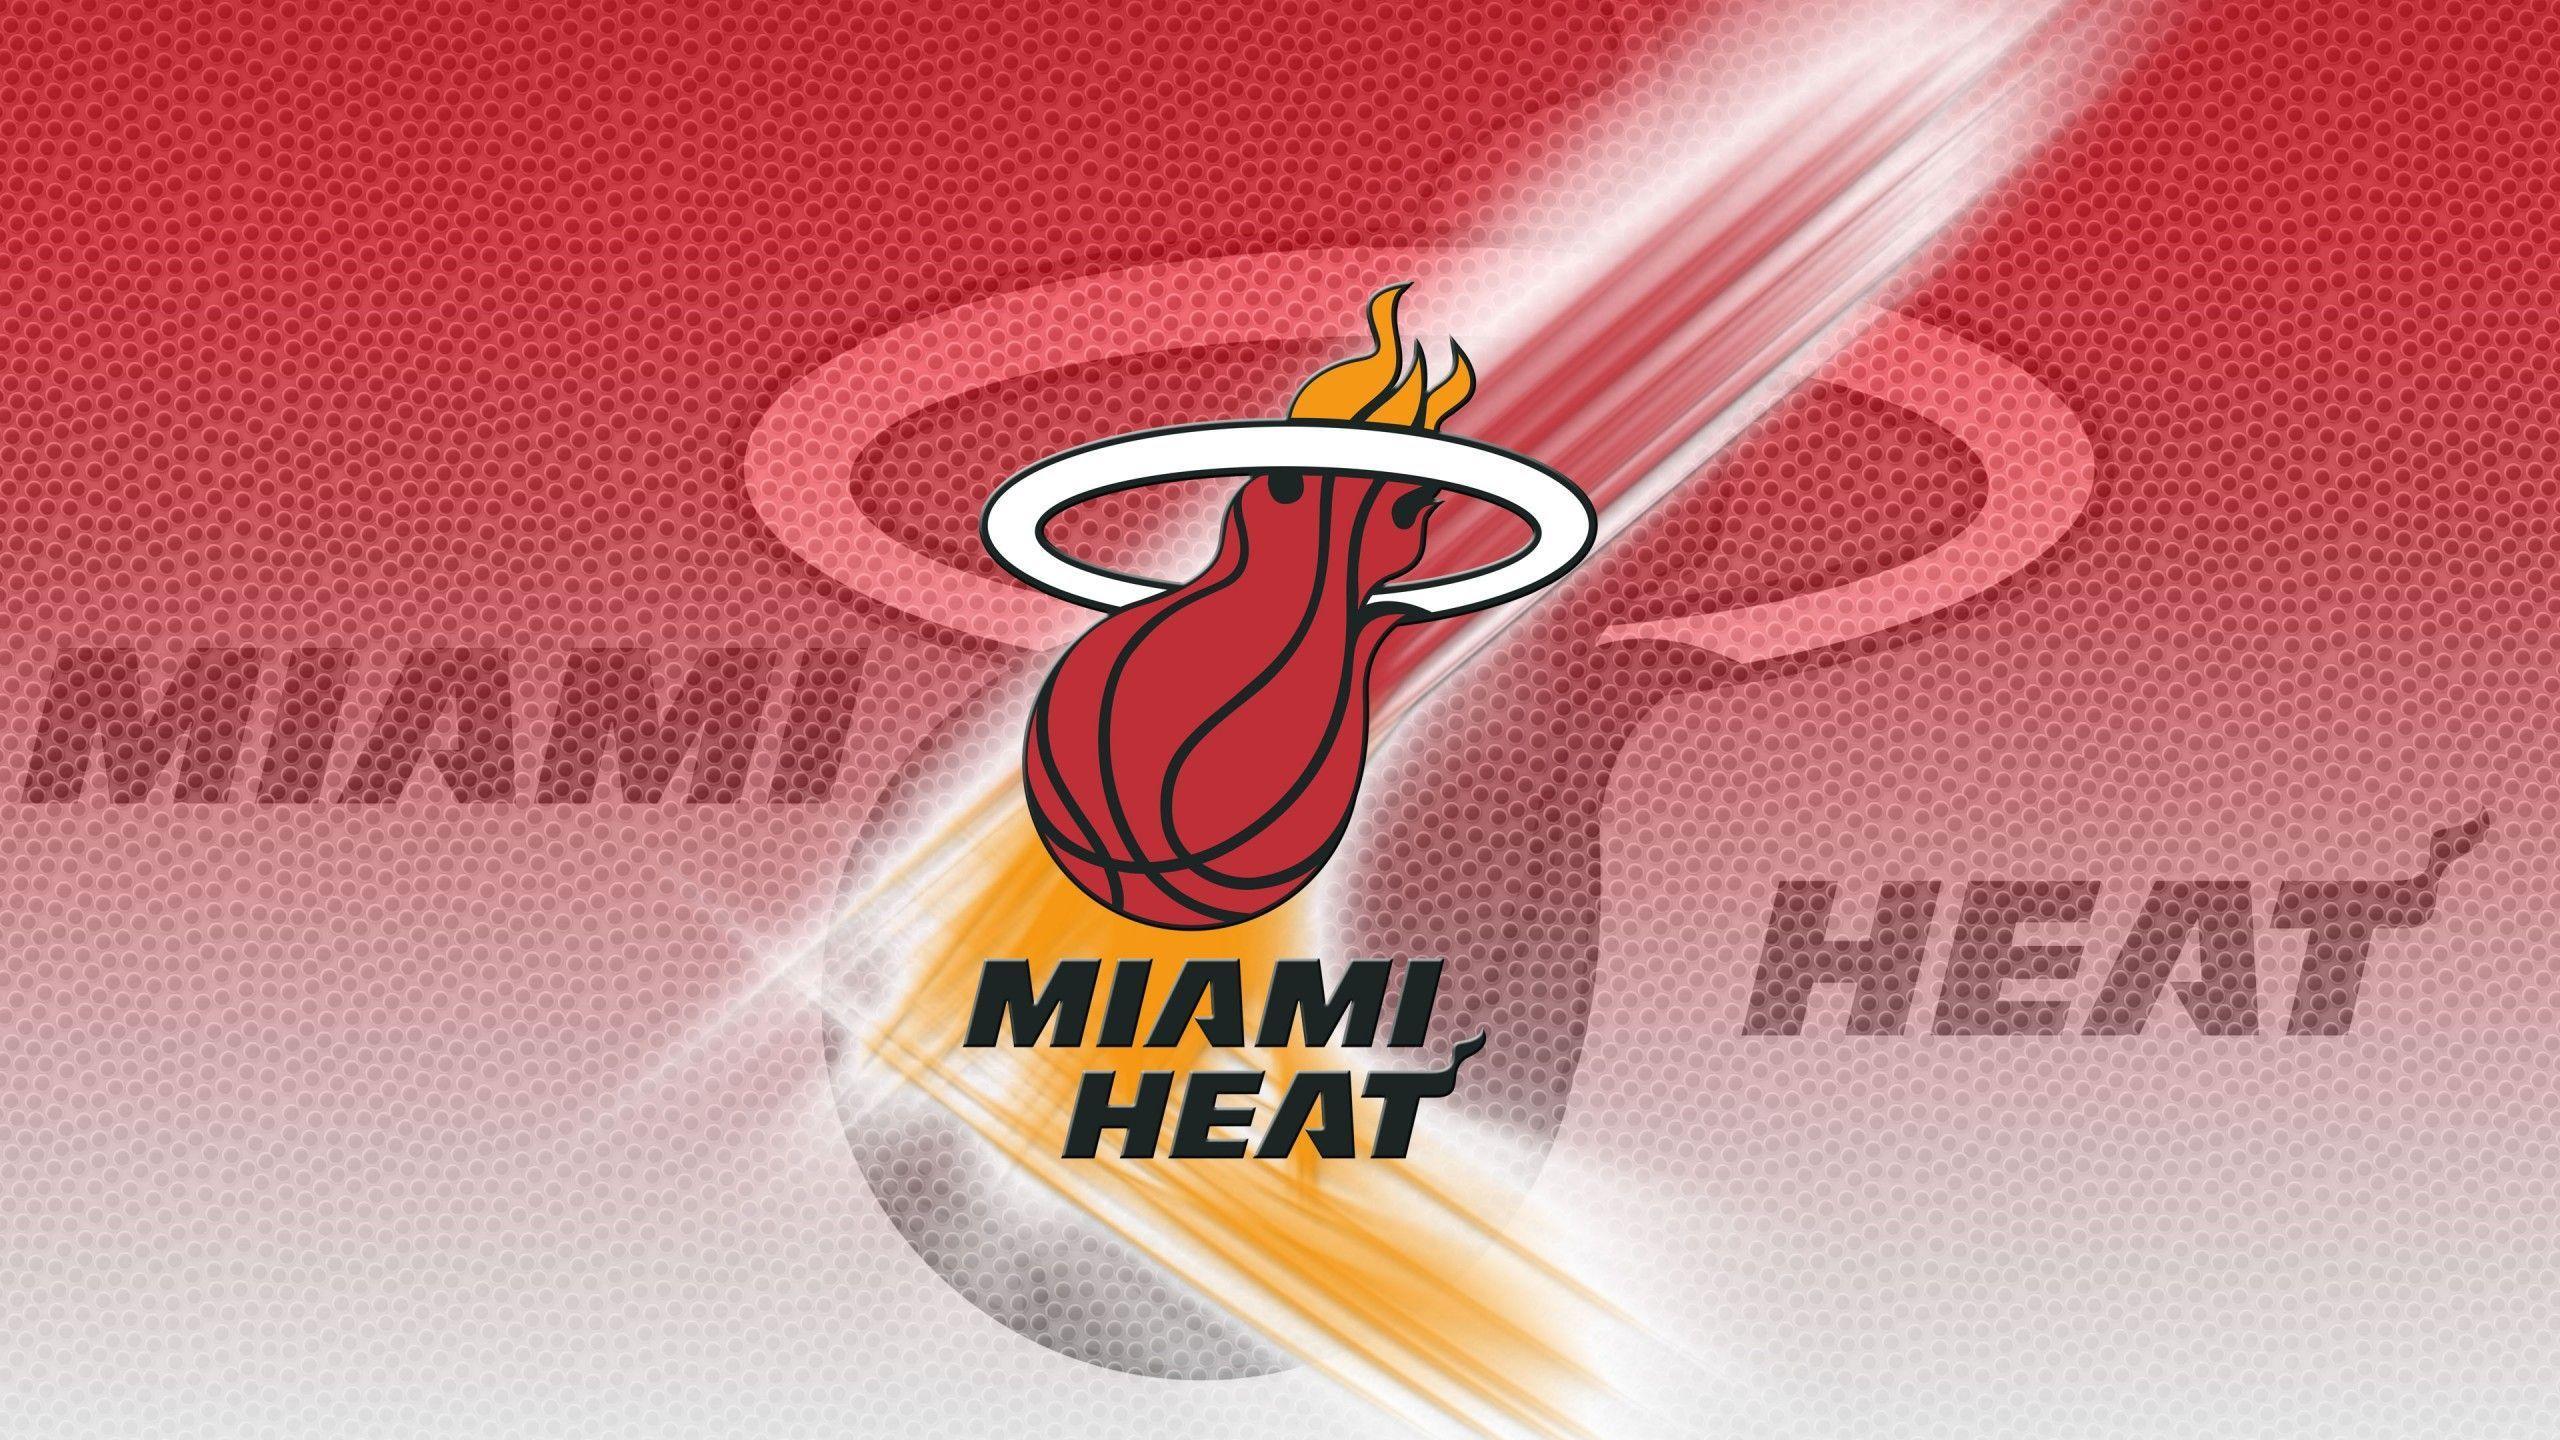 Miami Heat HD Wallpapers - Wallpaper Cave